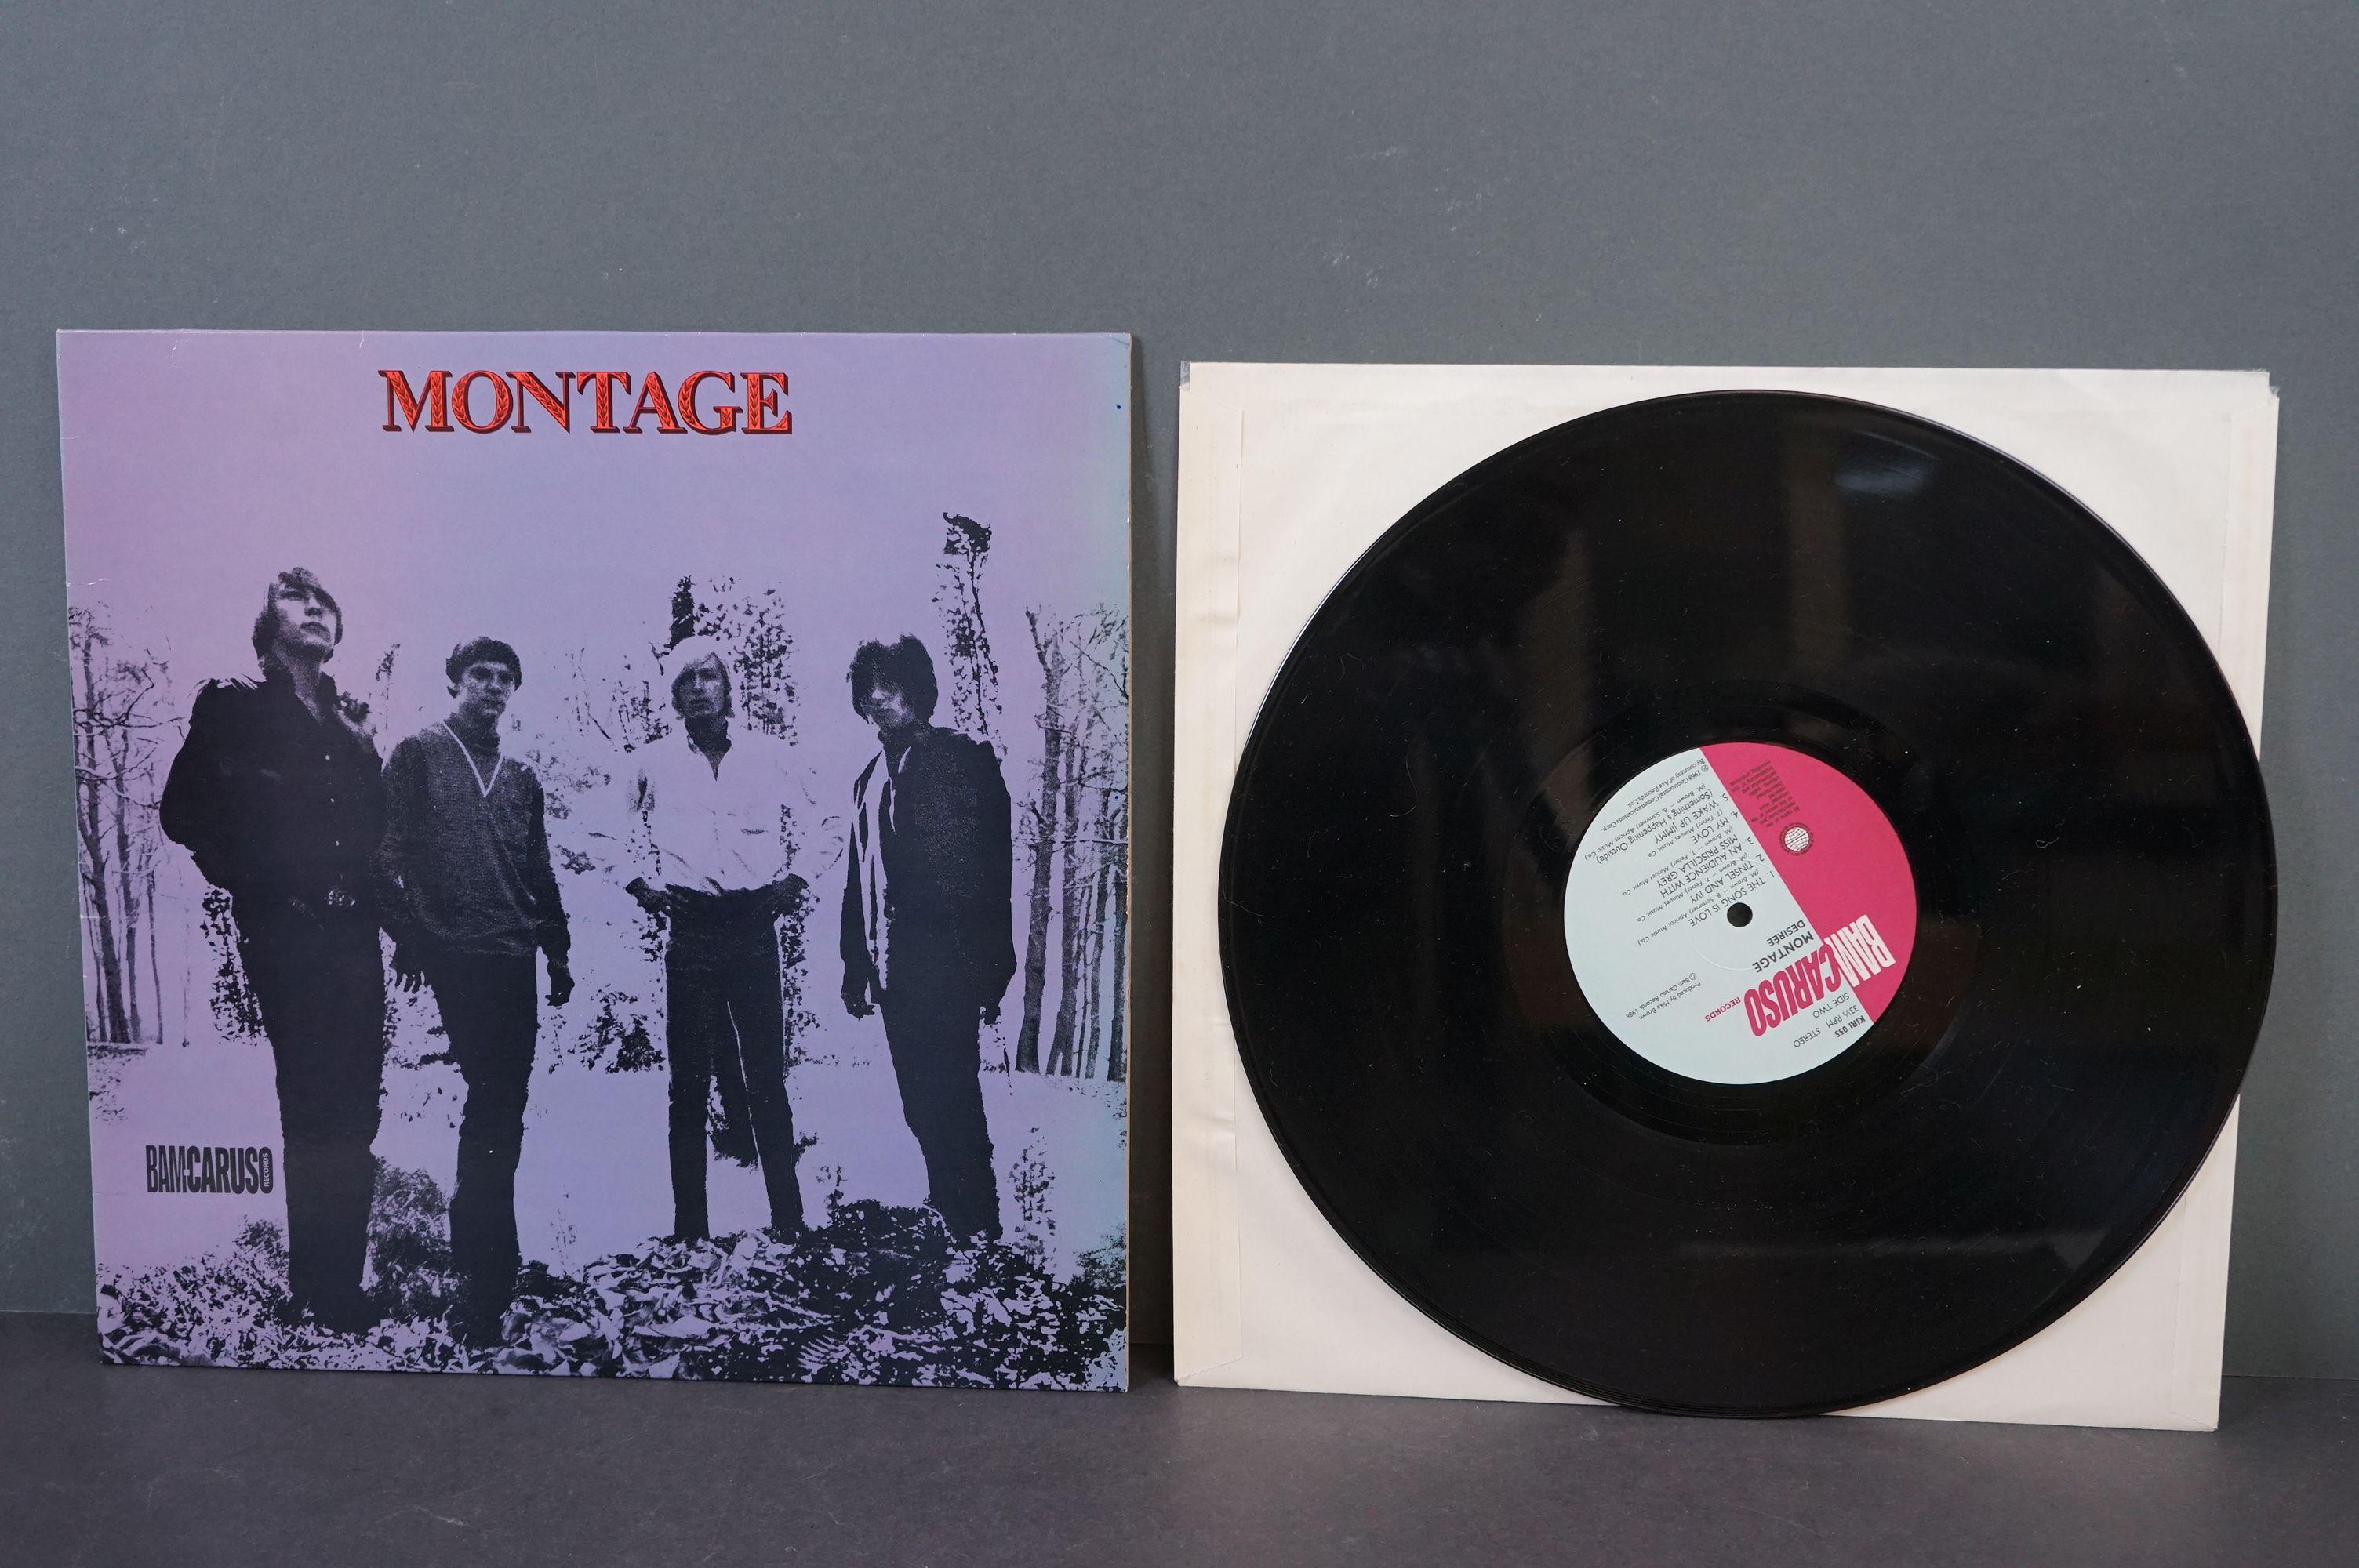 Vinyl - Psych / Prog - Five long deleted reissues of UK Psych / Prog Albums. Open Mind - Open - Image 2 of 12